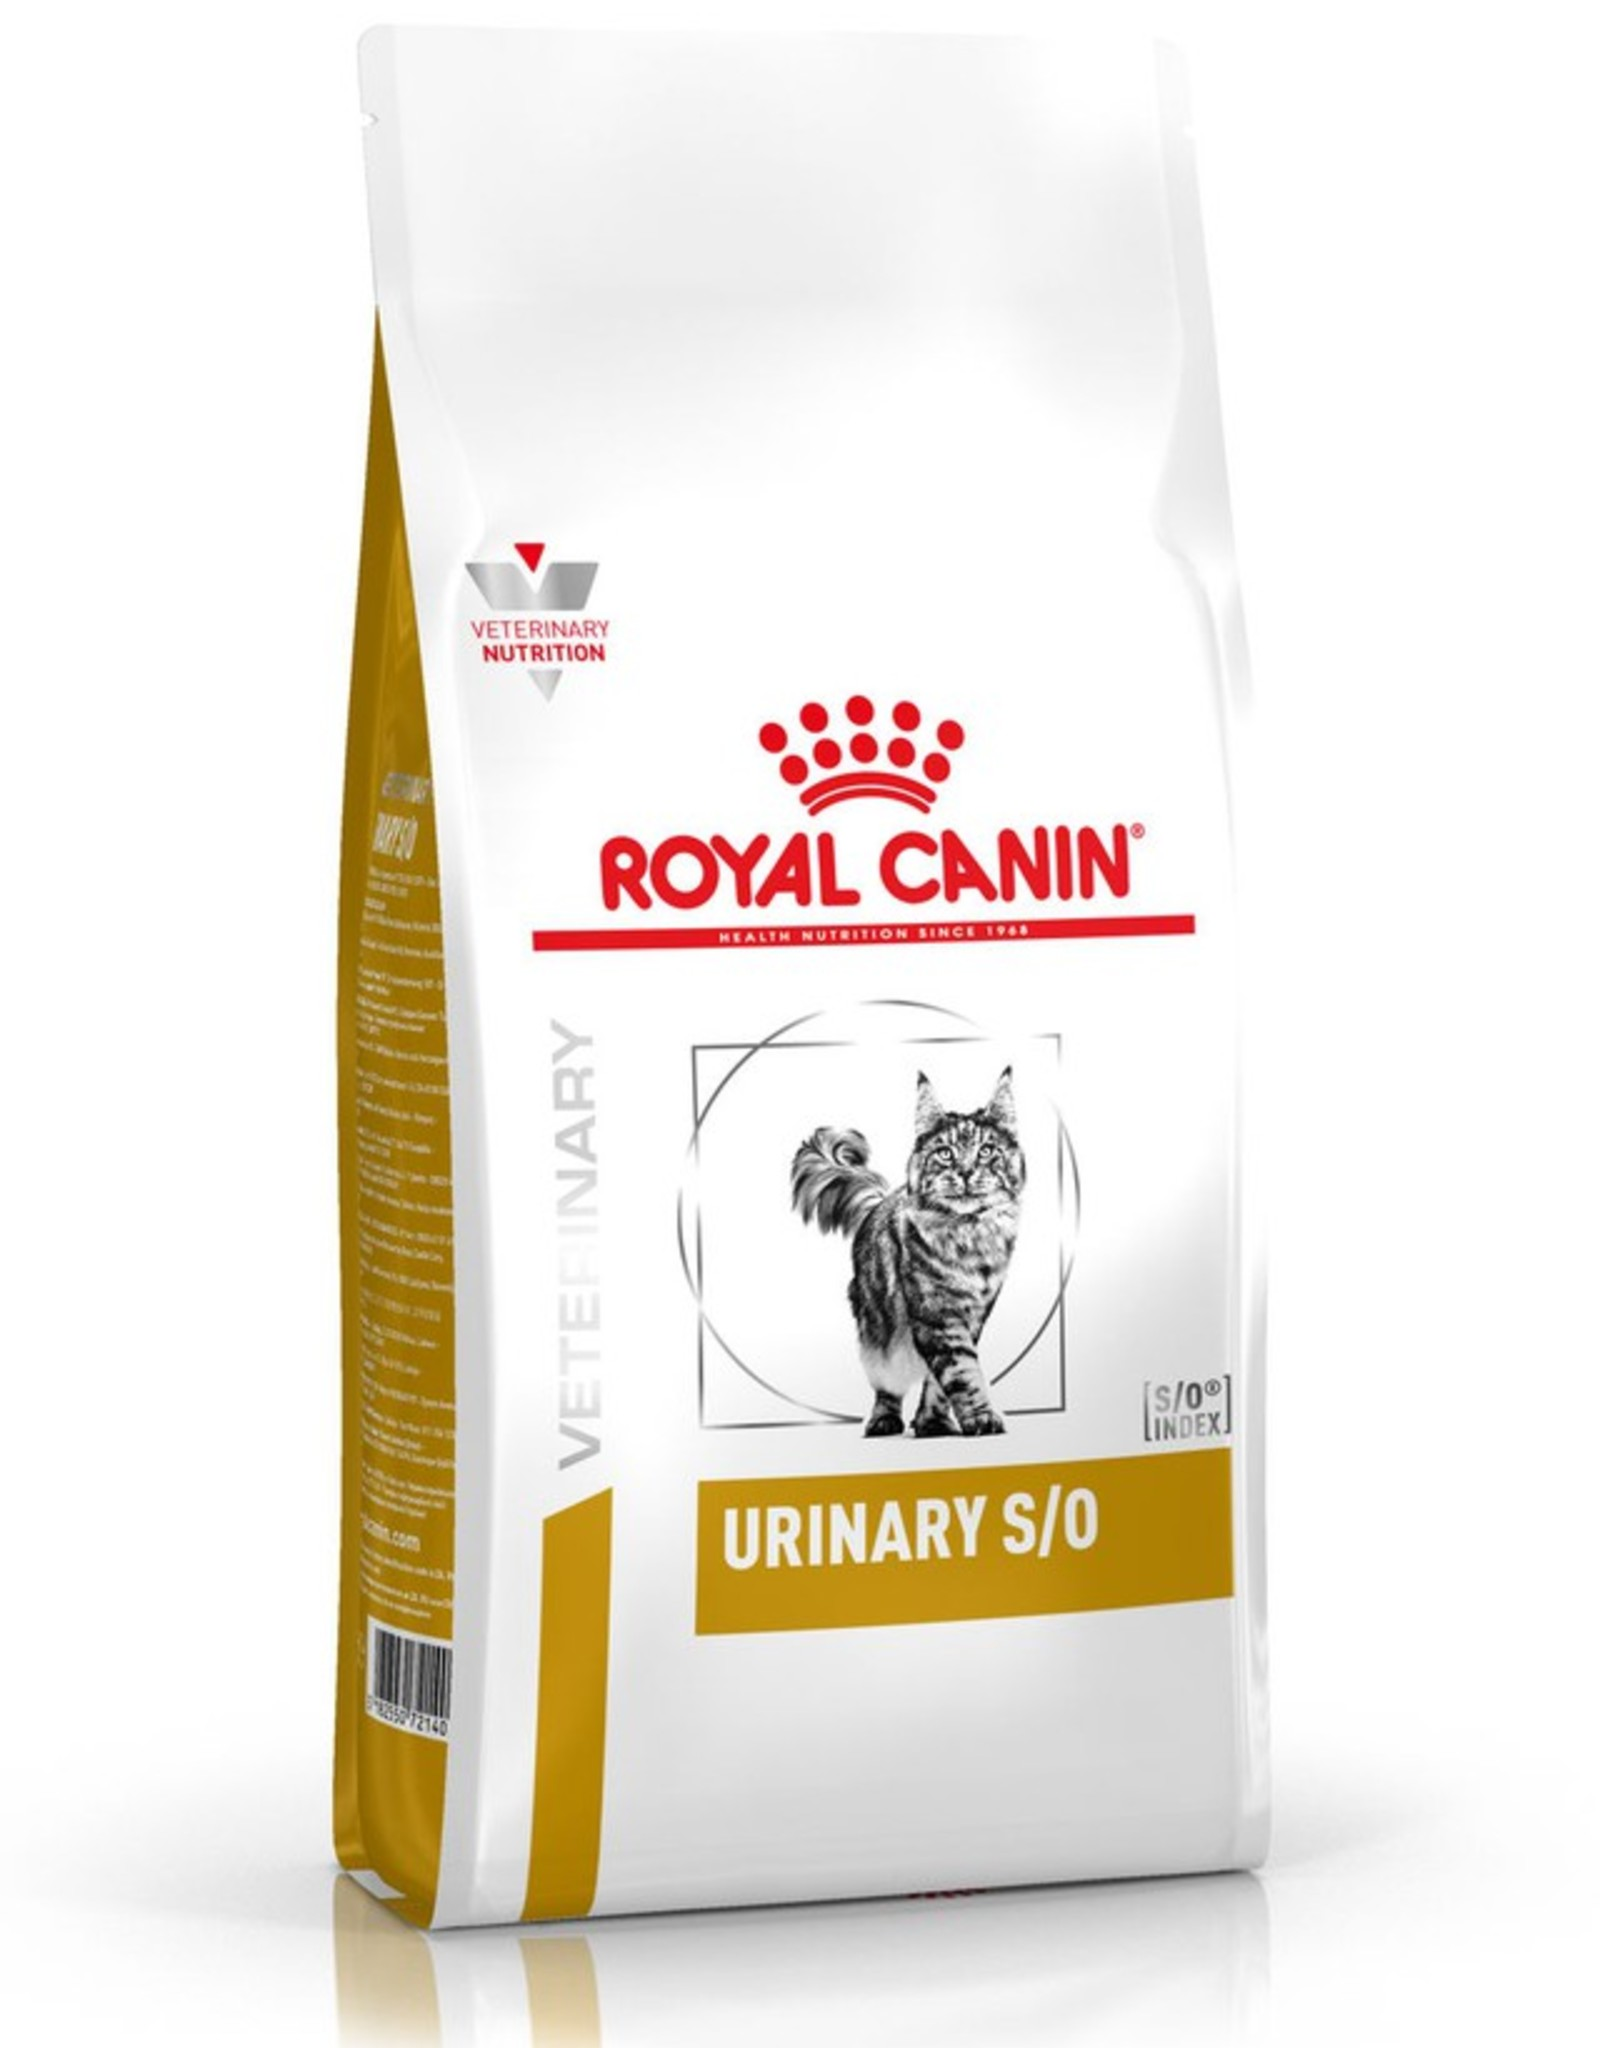 Royal Canin Royal Canin Urinary S/o Chat 7kg